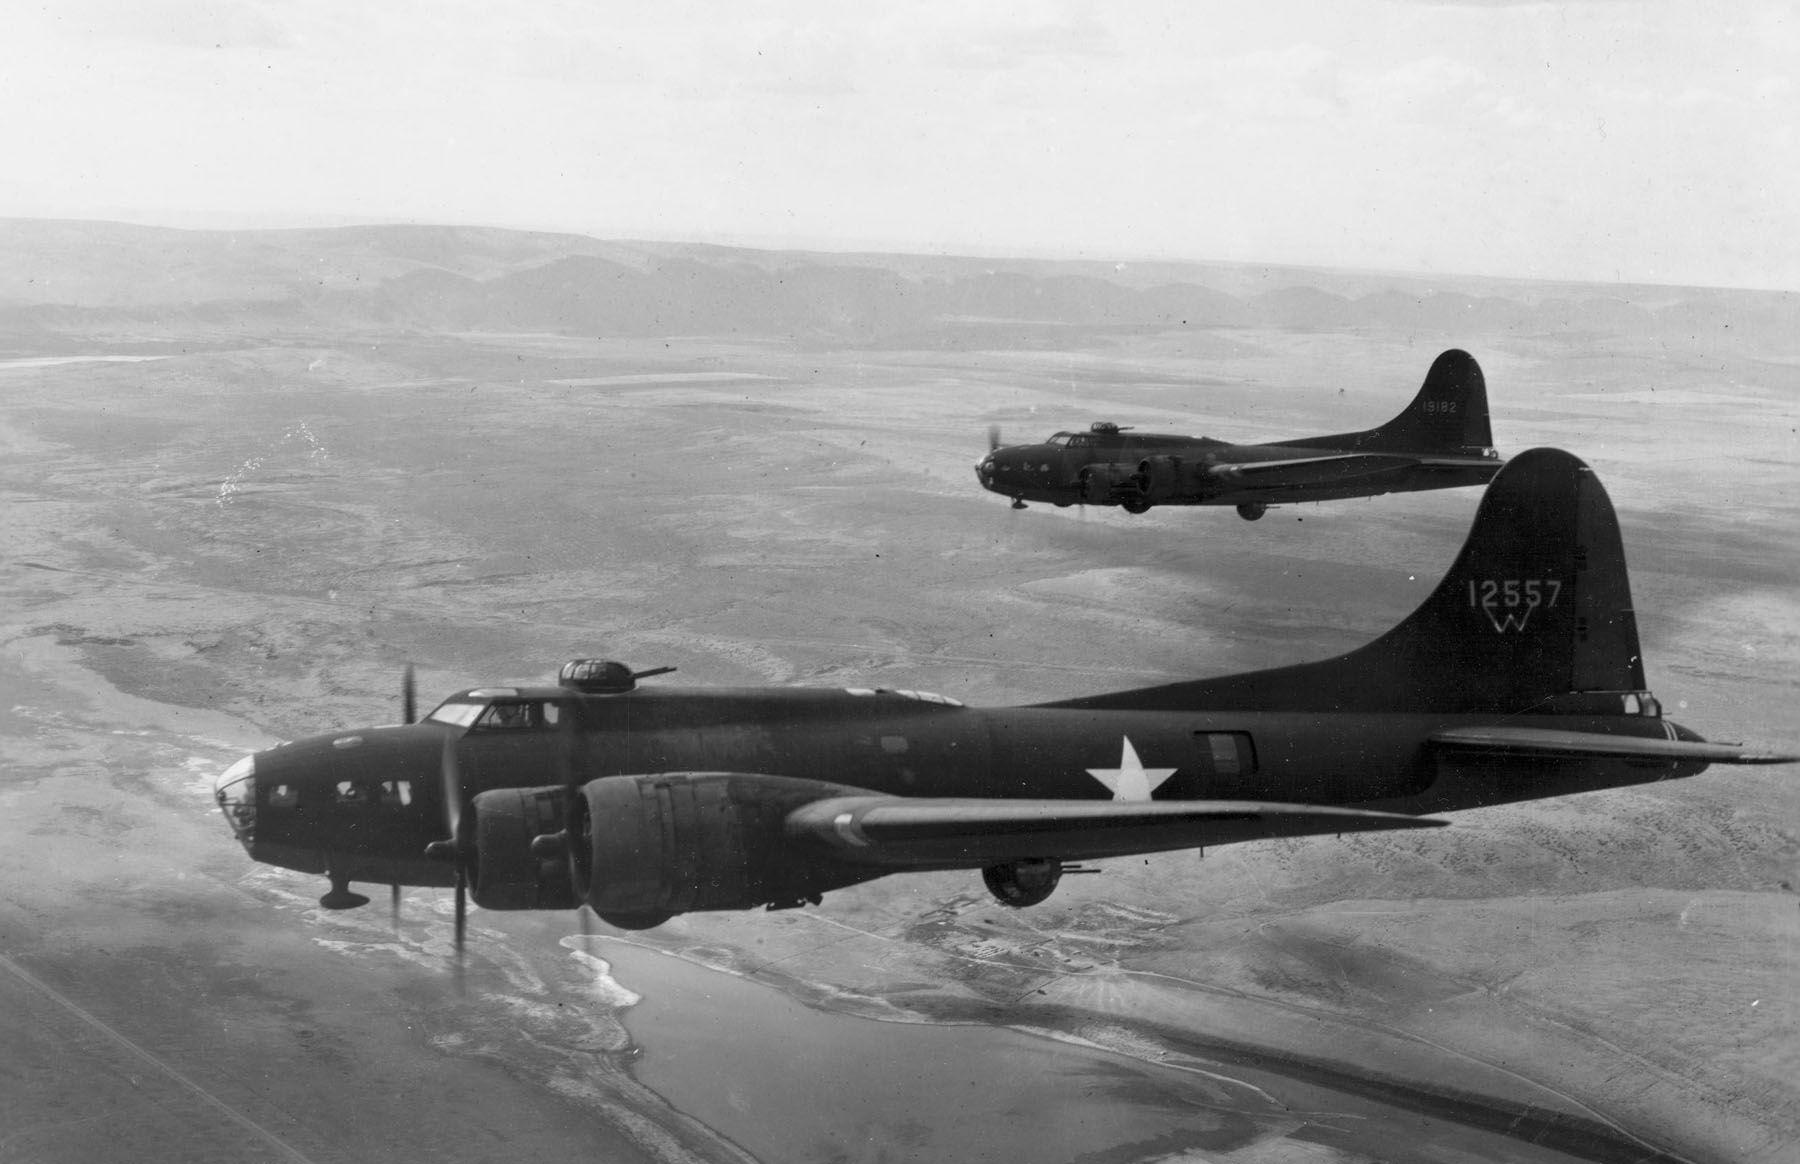 B-17 Flying Fortress in World War II